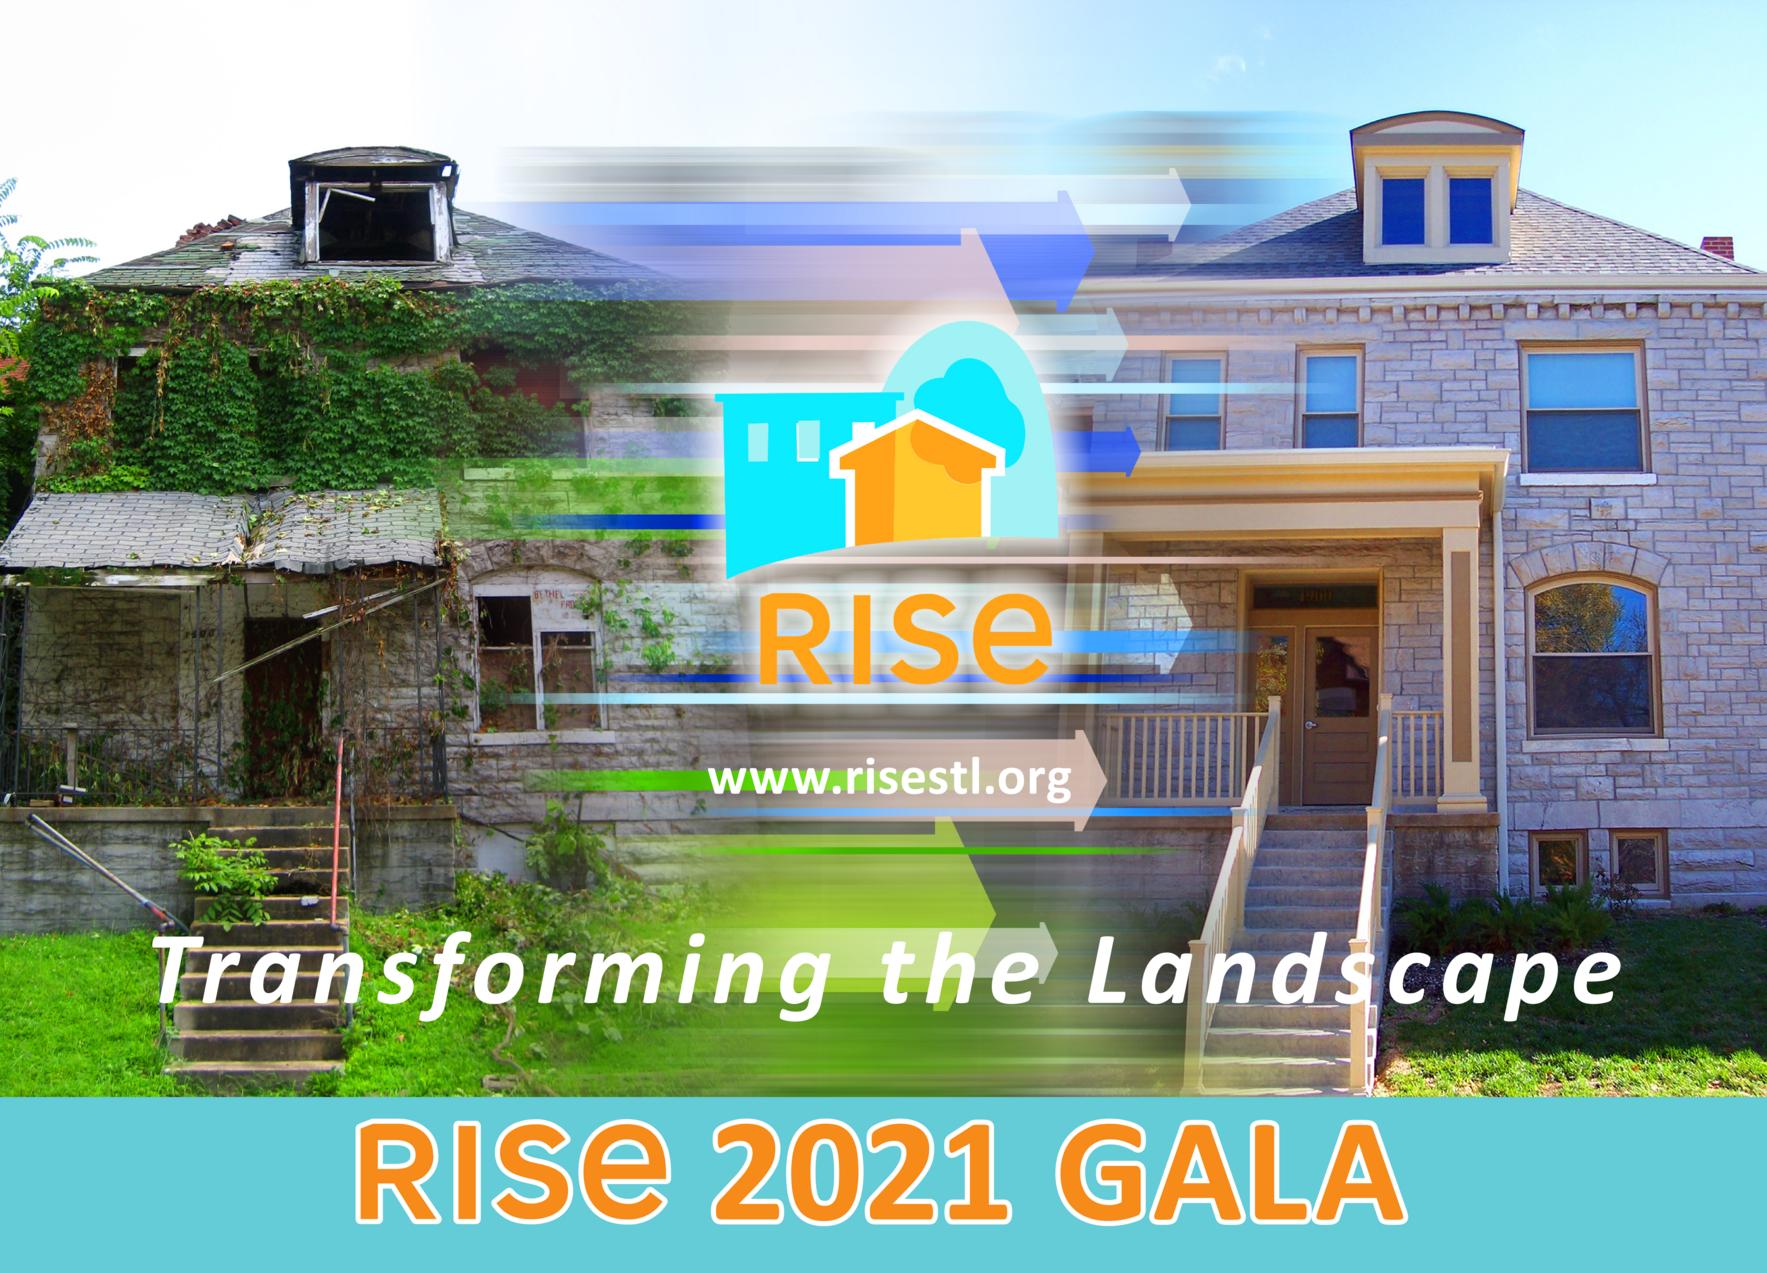 Rise 2021 Transforming the Landscape Gala image